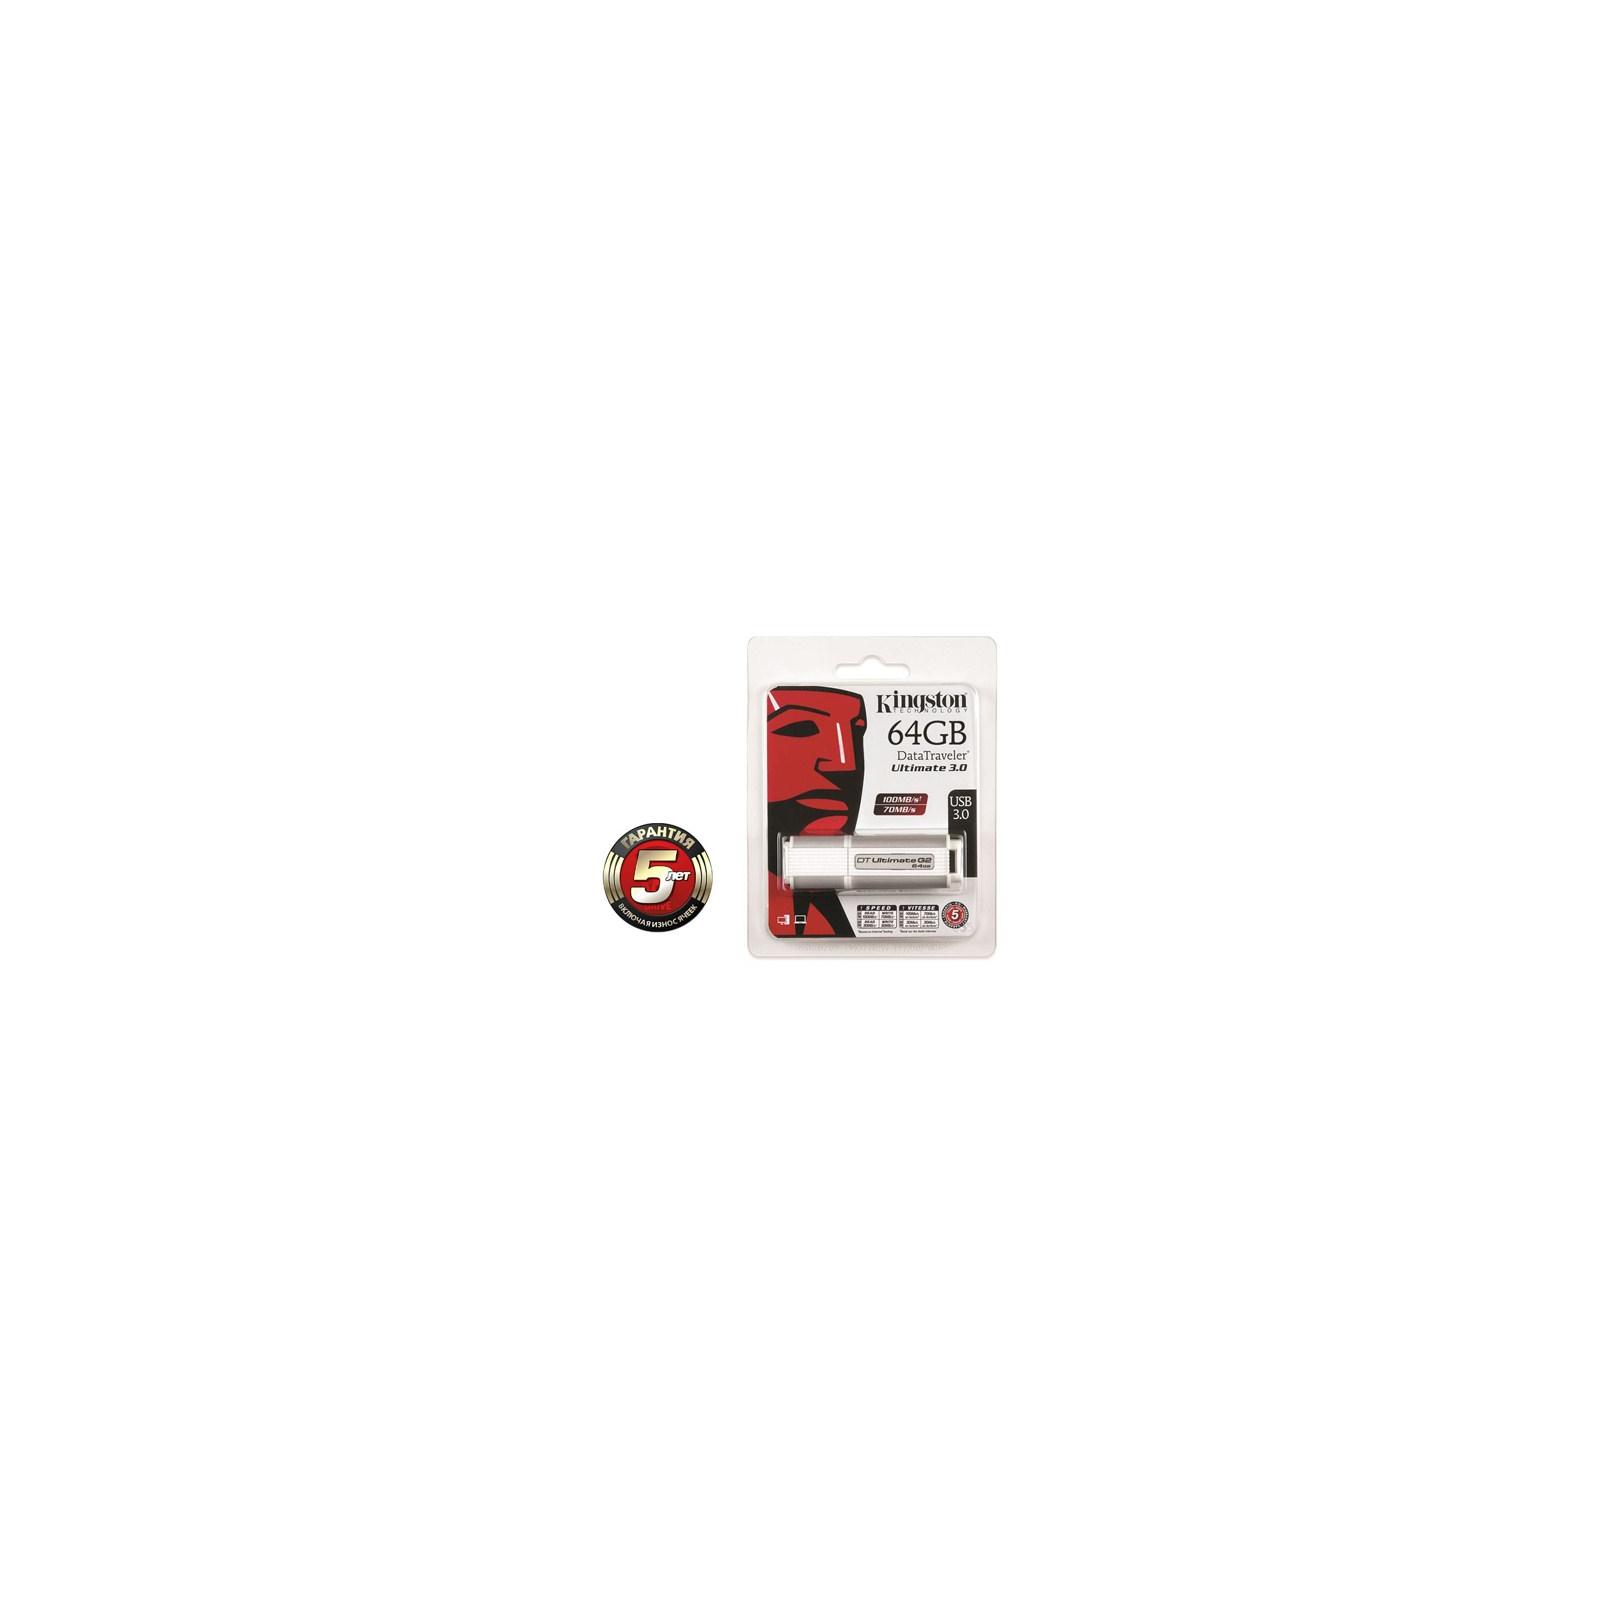 USB флеш накопитель Kingston 64Gb DataTraveler Ultimate (DTU30G2/64GB) изображение 3